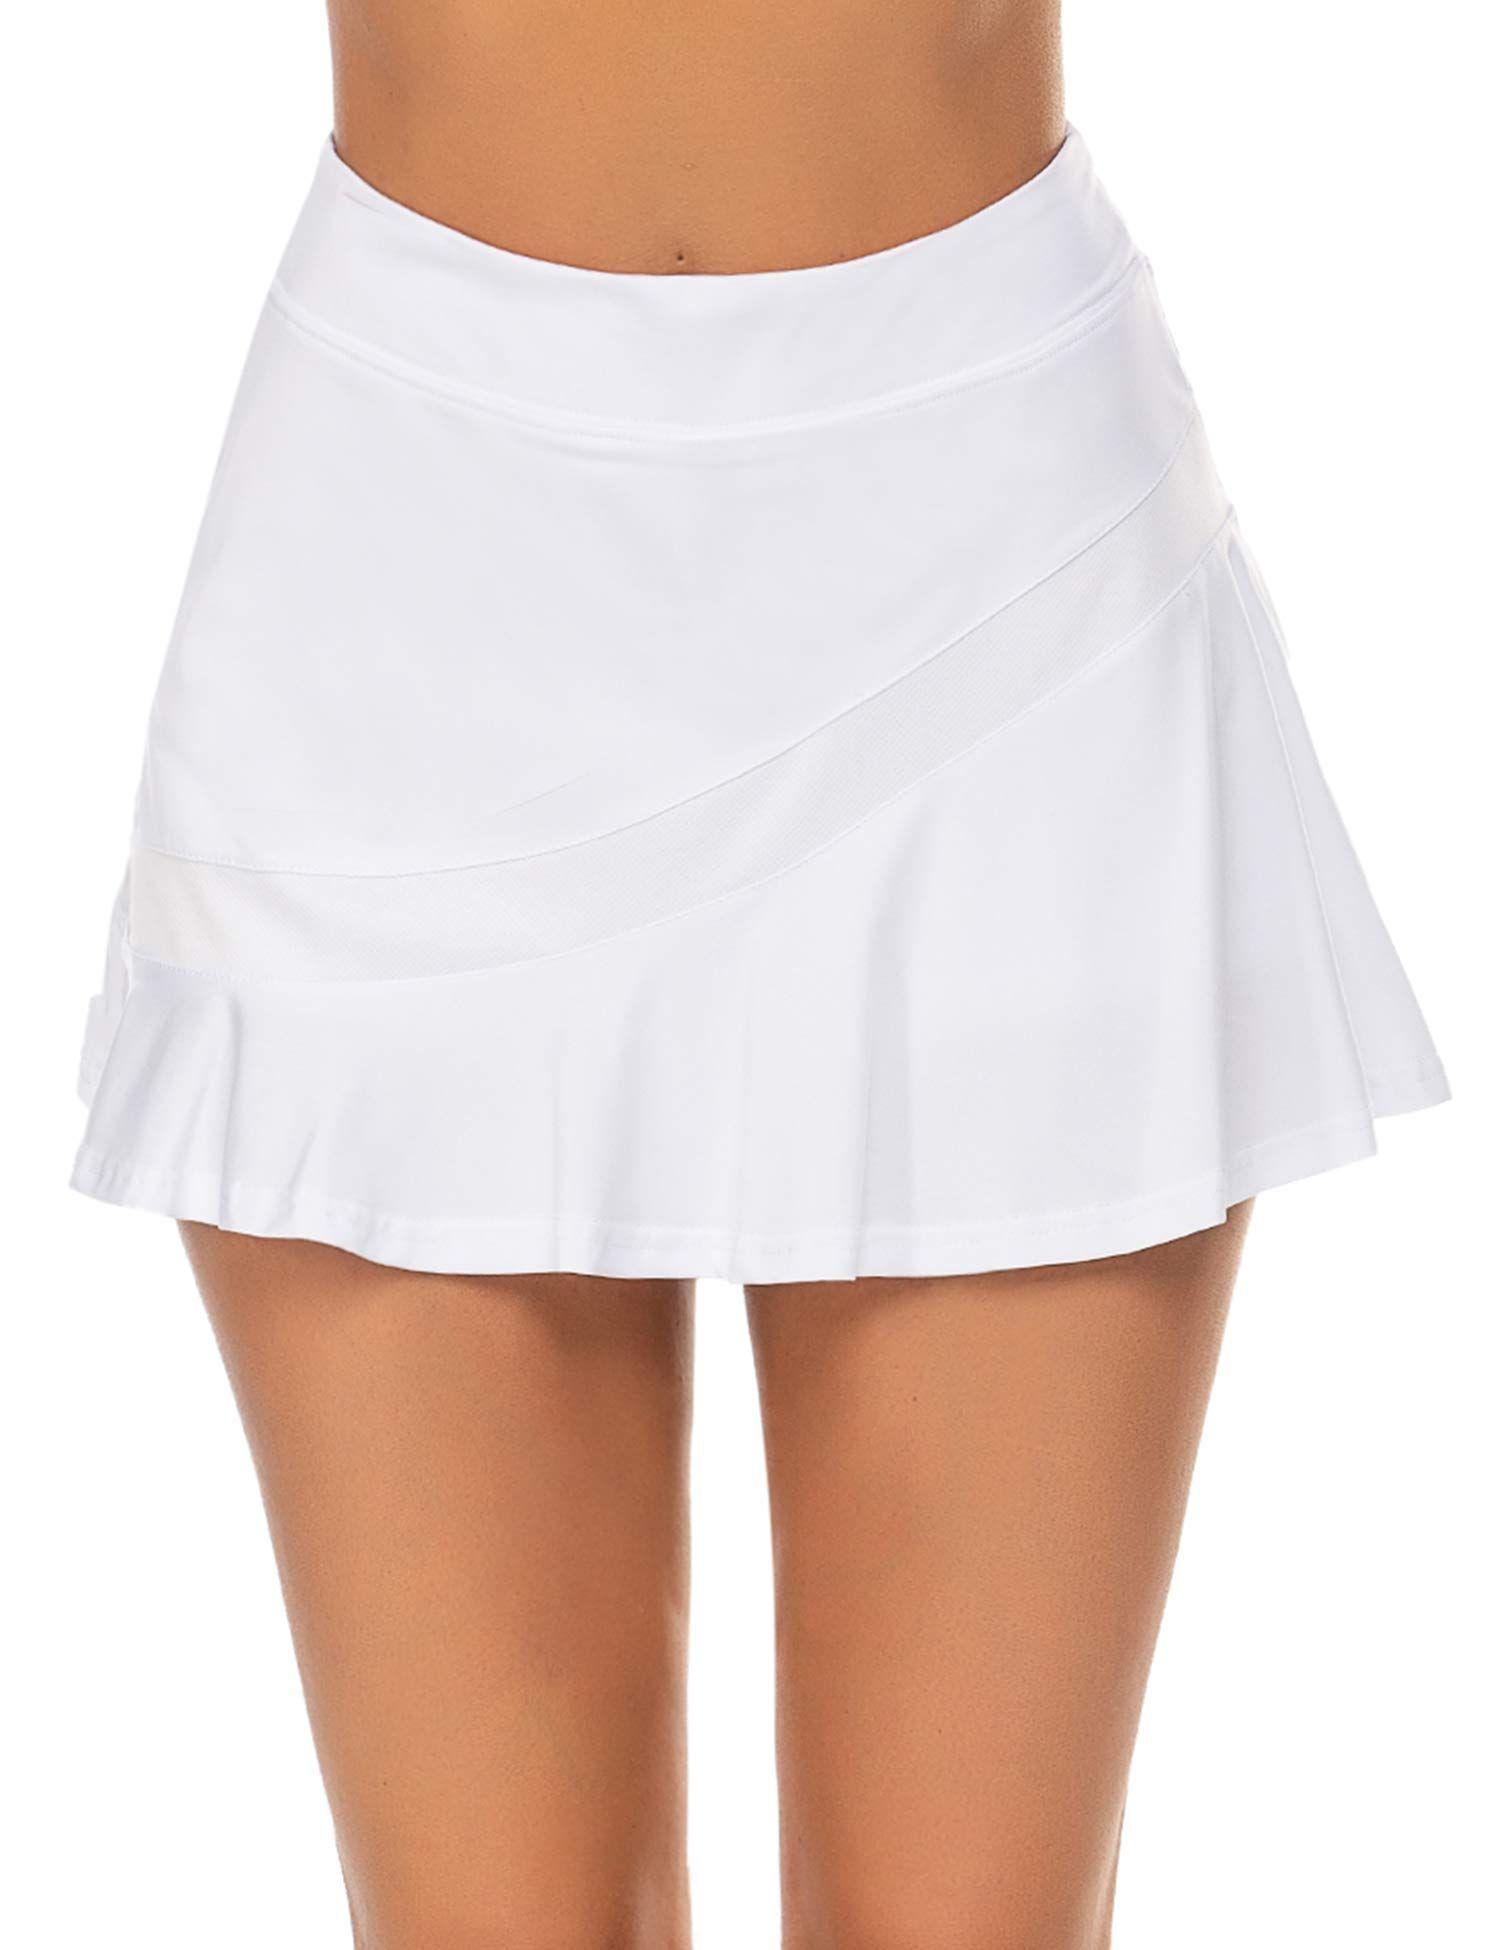 Buy Ekouaer Women's Athletic Golf Skorts Lightweight Skirt Pleated with  Pockets for Running Tennis Workout   Pleated tennis skirt, Lightweight  skirt, Golf skort